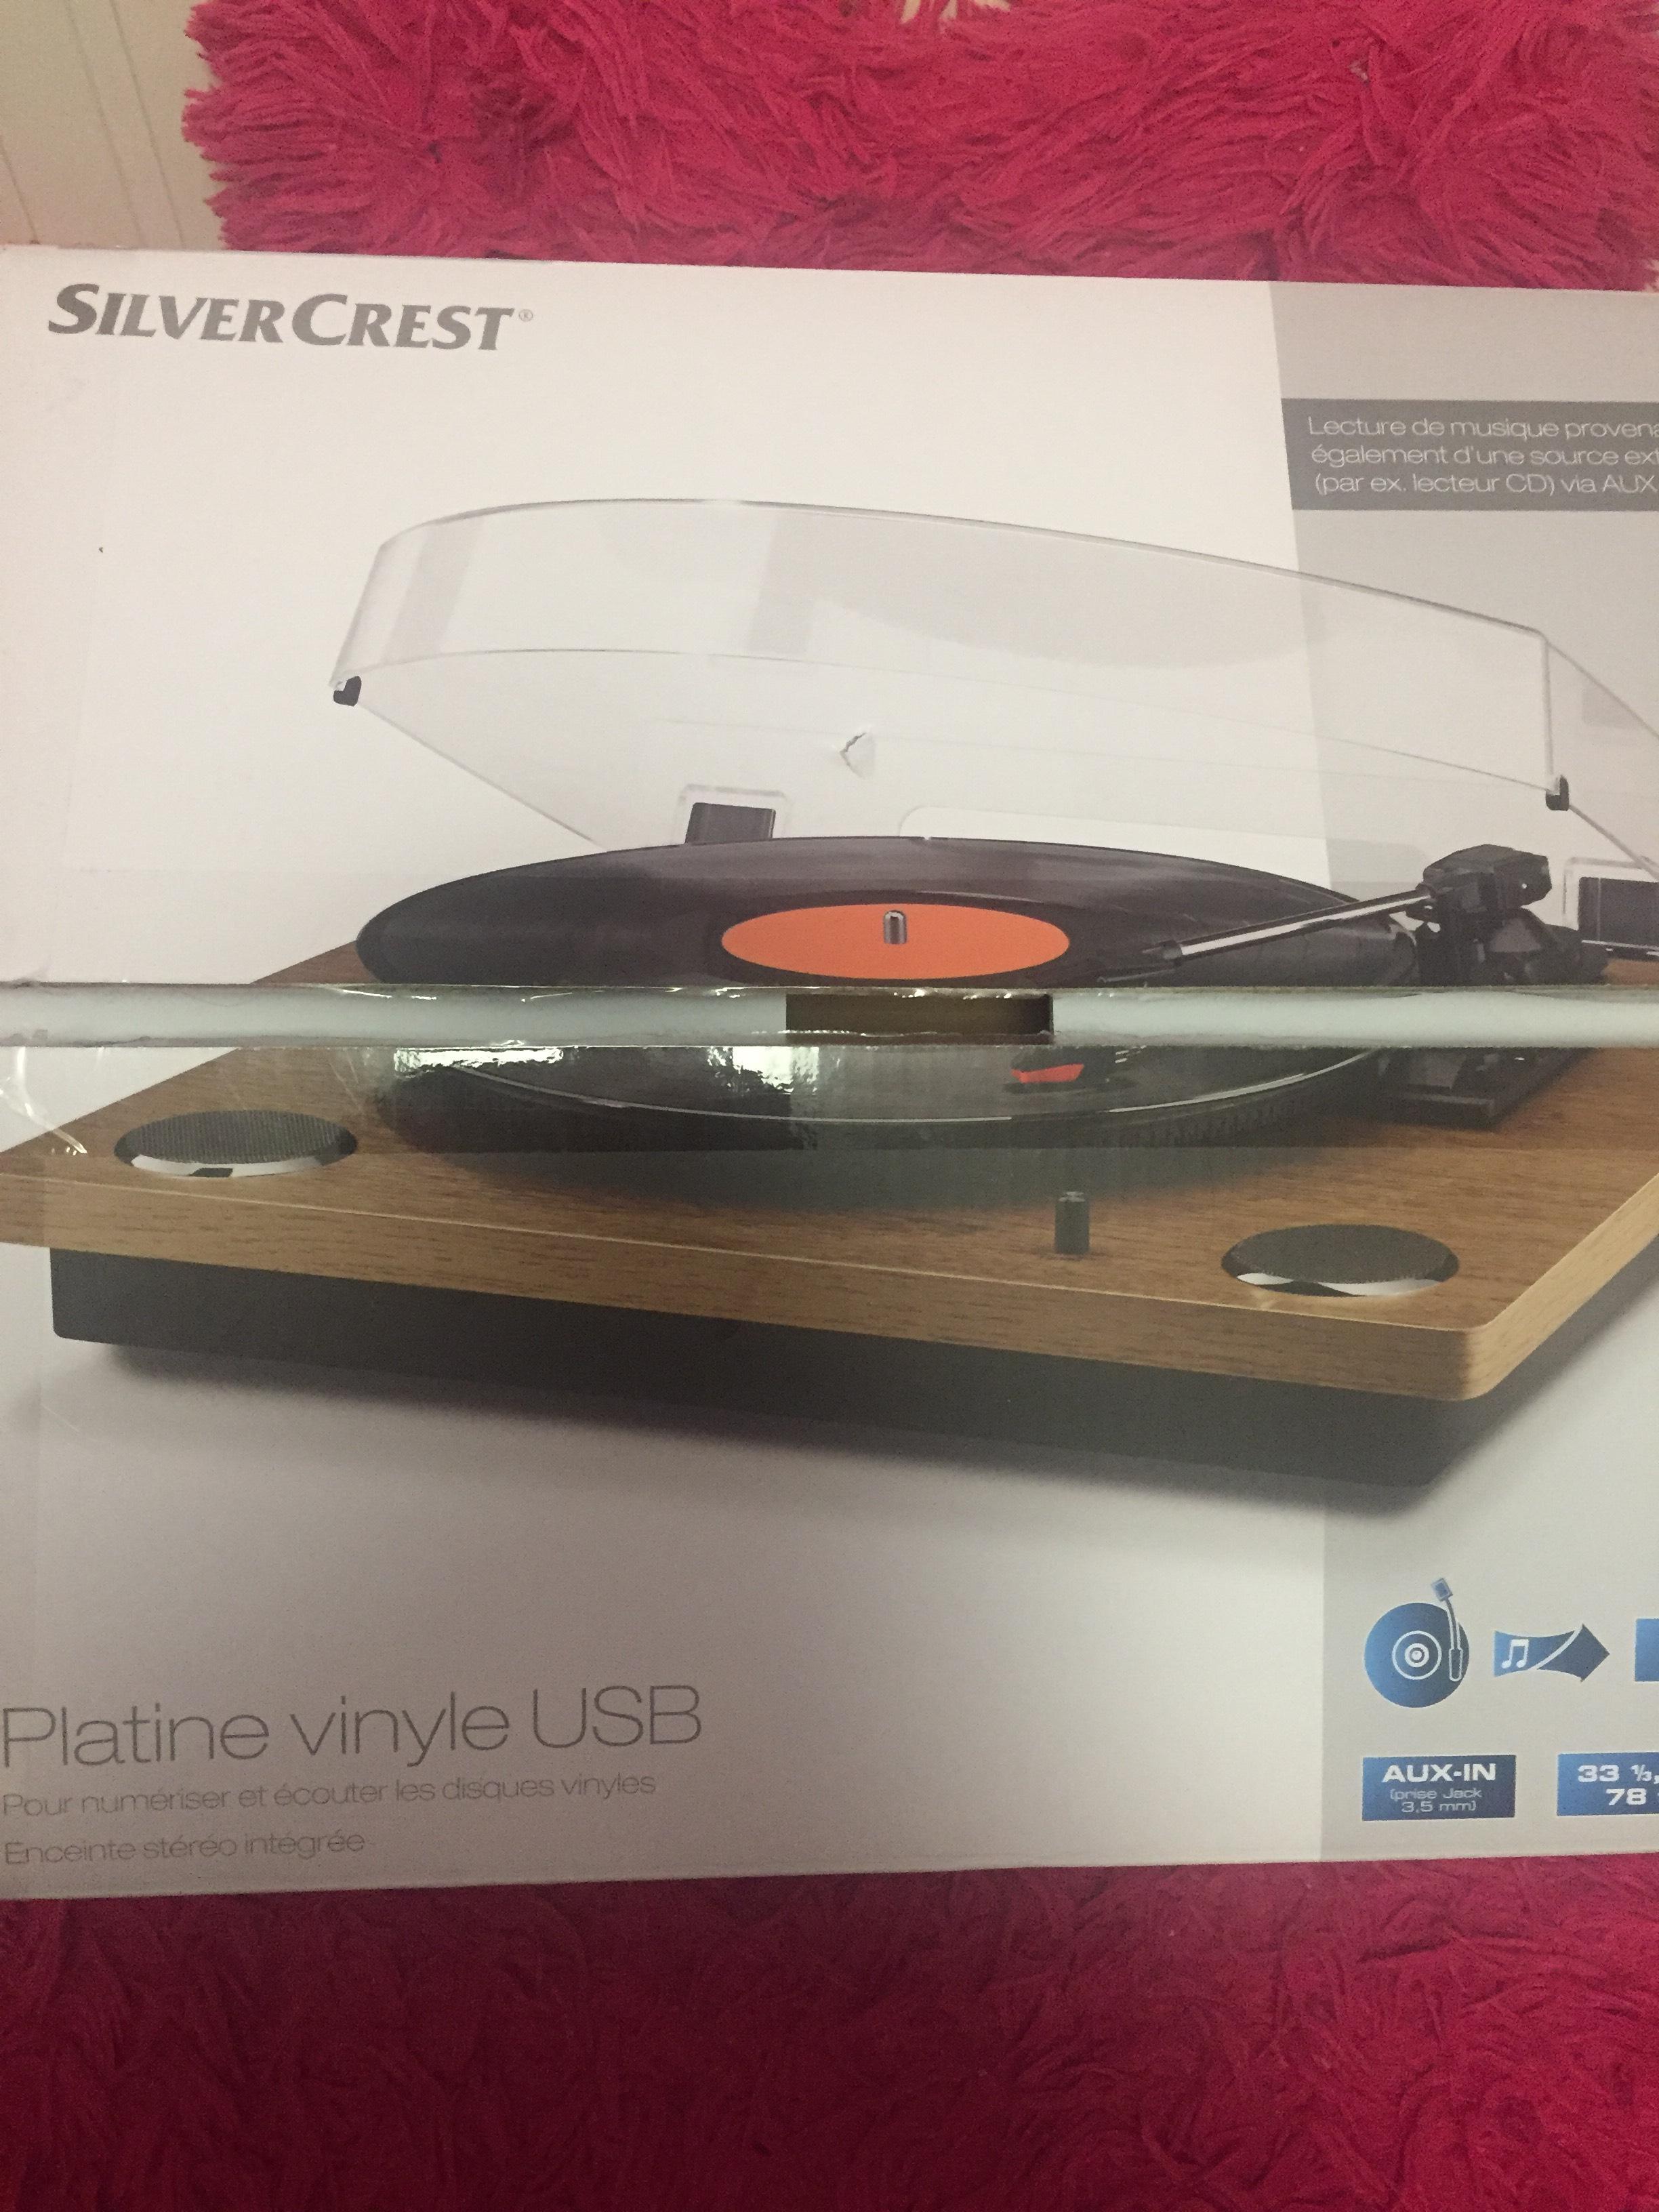 Platine Vinyle Usb Silvercrest Lidl St Martin Dheres 38